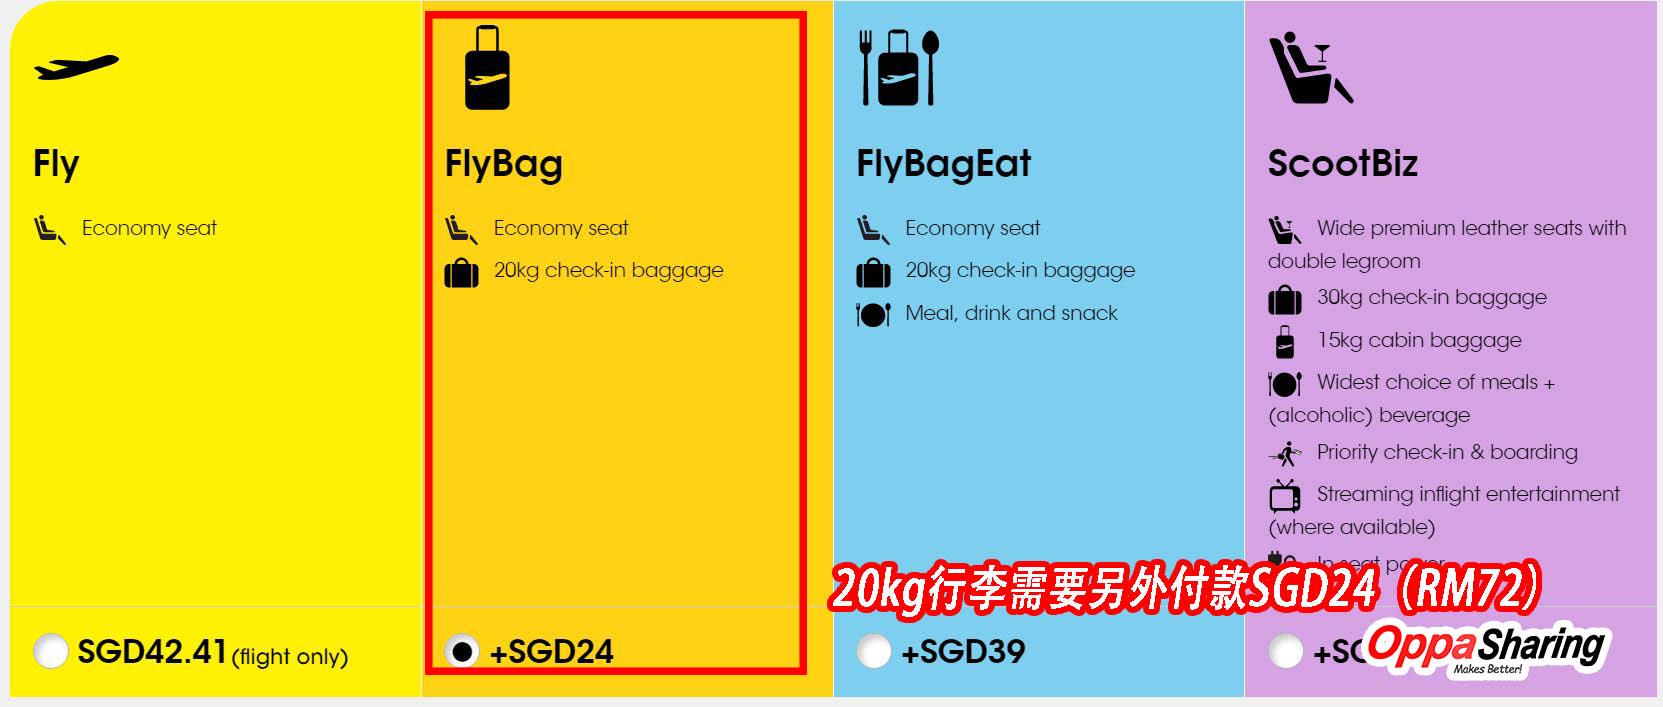 bangkok-dmk-plus-luggage